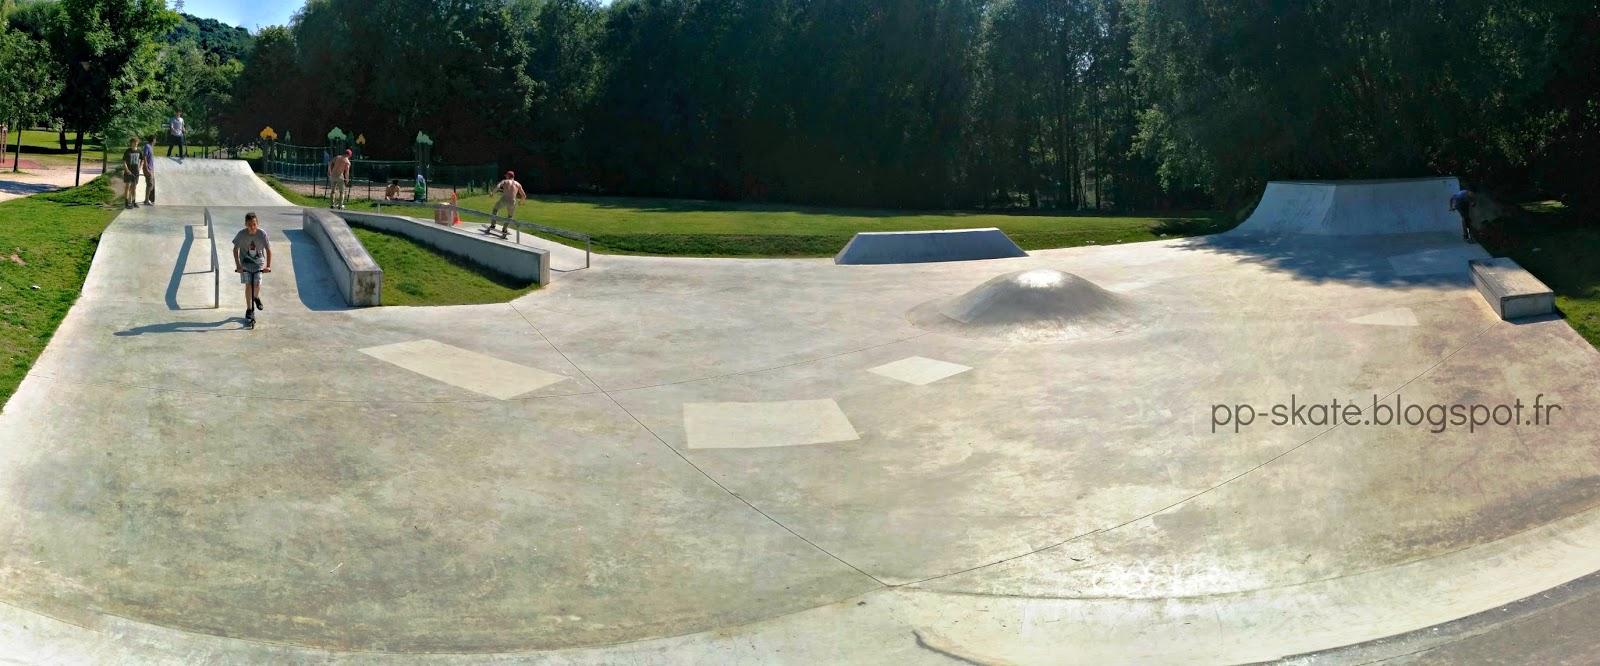 Skatepark Saint-Cheron panoramique